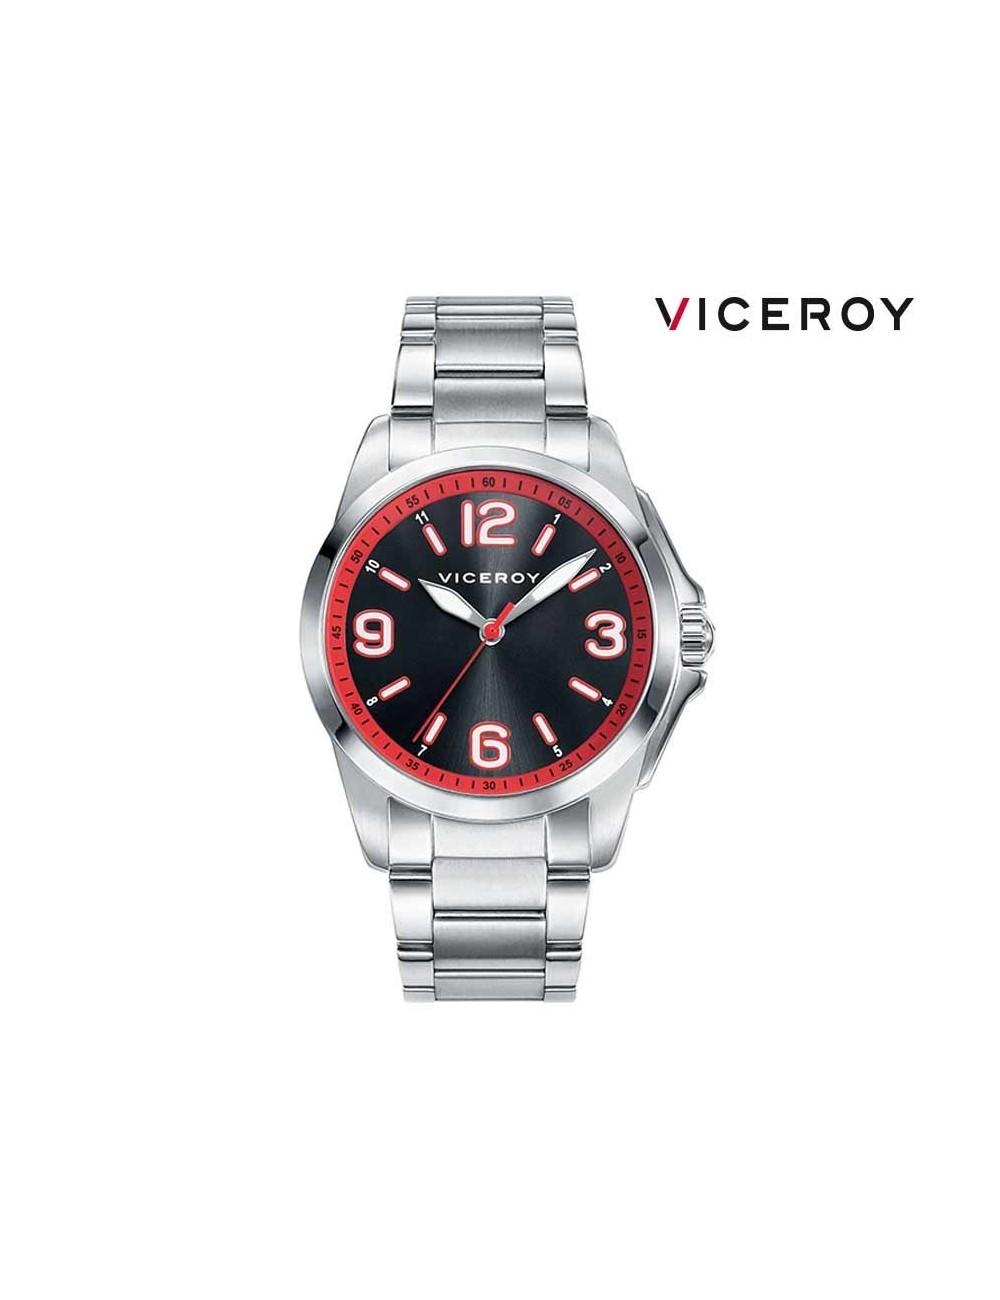 fb7e5fc5166c Reloj niño Viceroy cadena esfera negra 42267-54 redondo